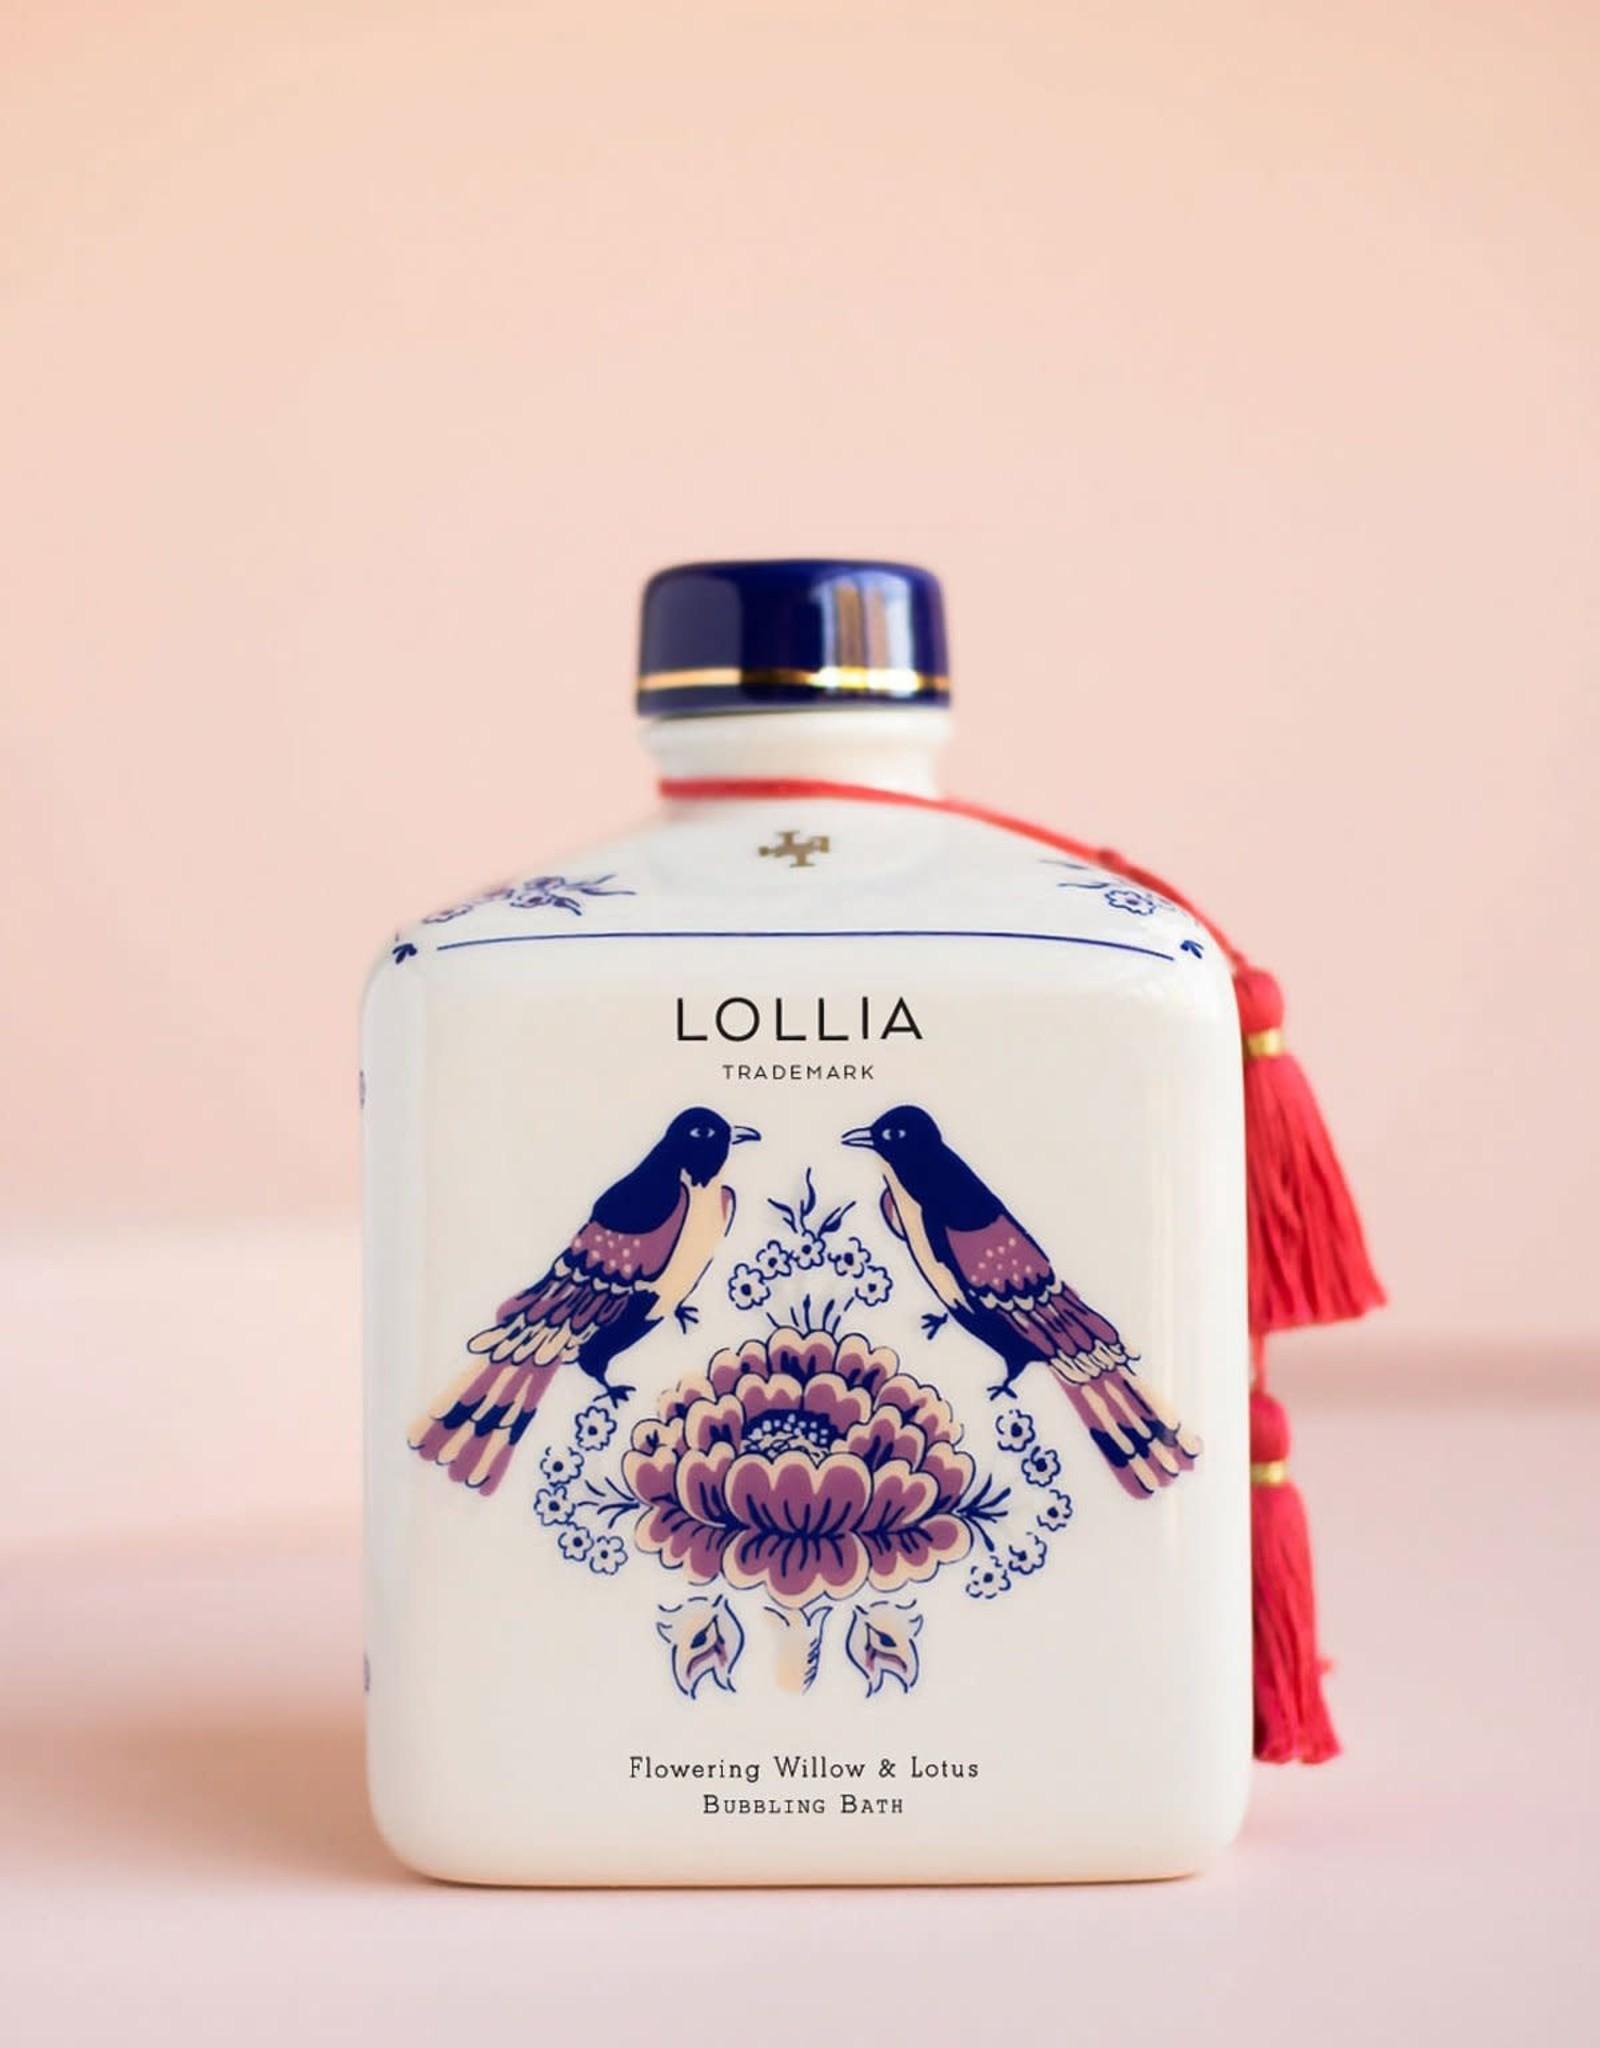 Lollia Lollia Imagine Collection